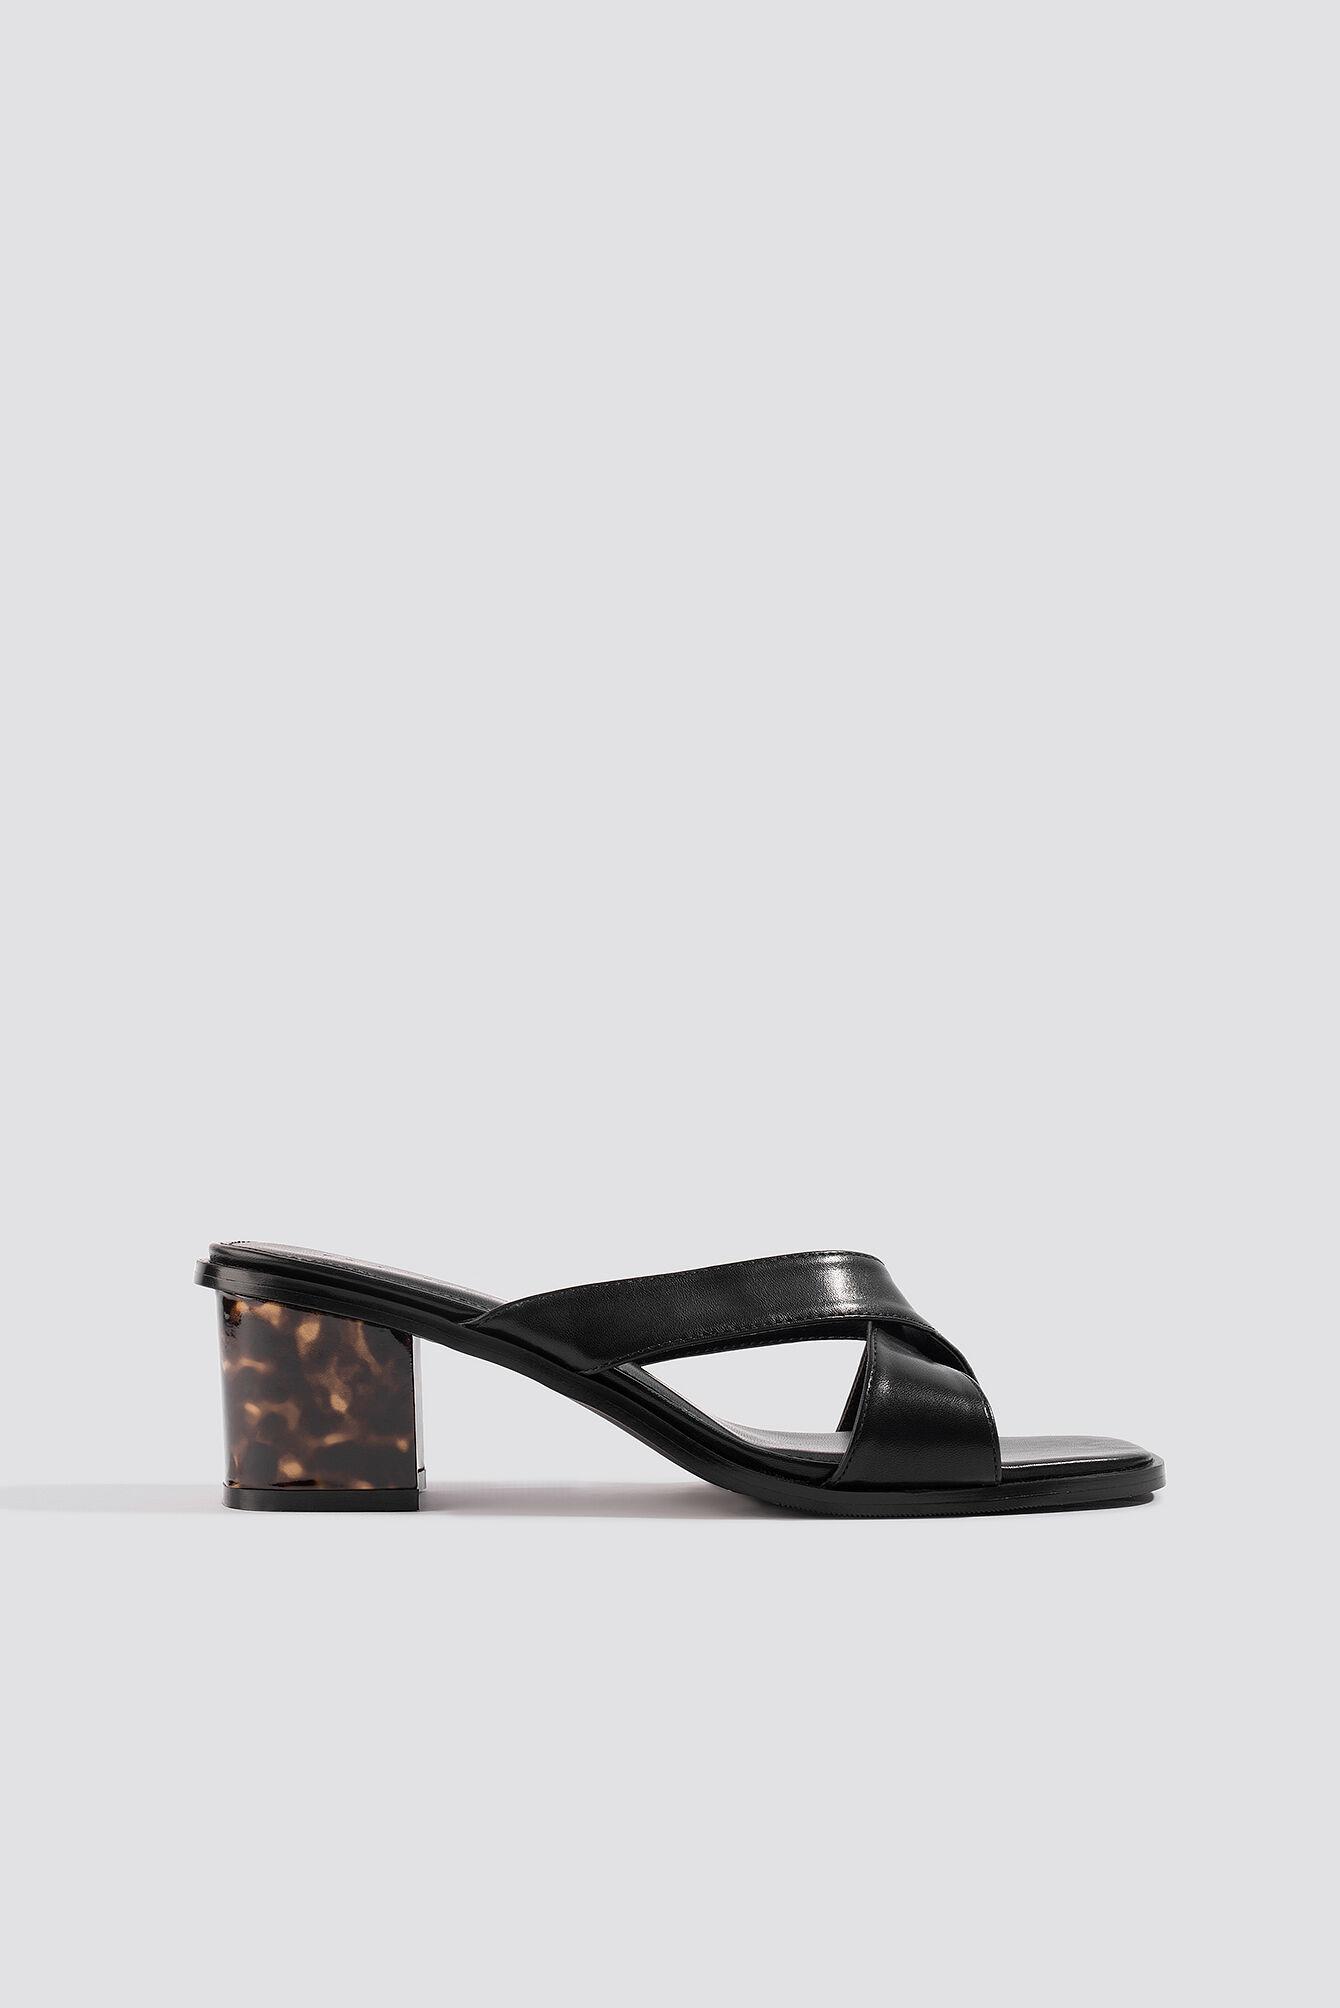 NA-KD Shoes Resin Heel Mules - Black